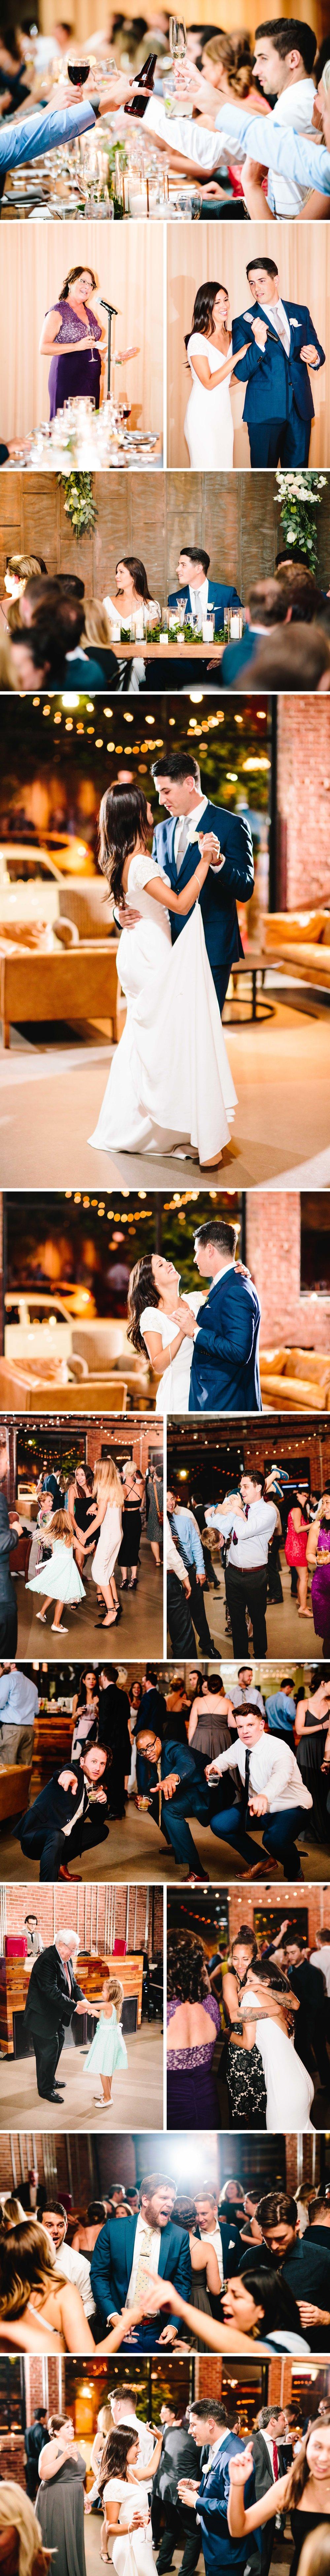 chicago-fine-art-wedding-photography-penninger11